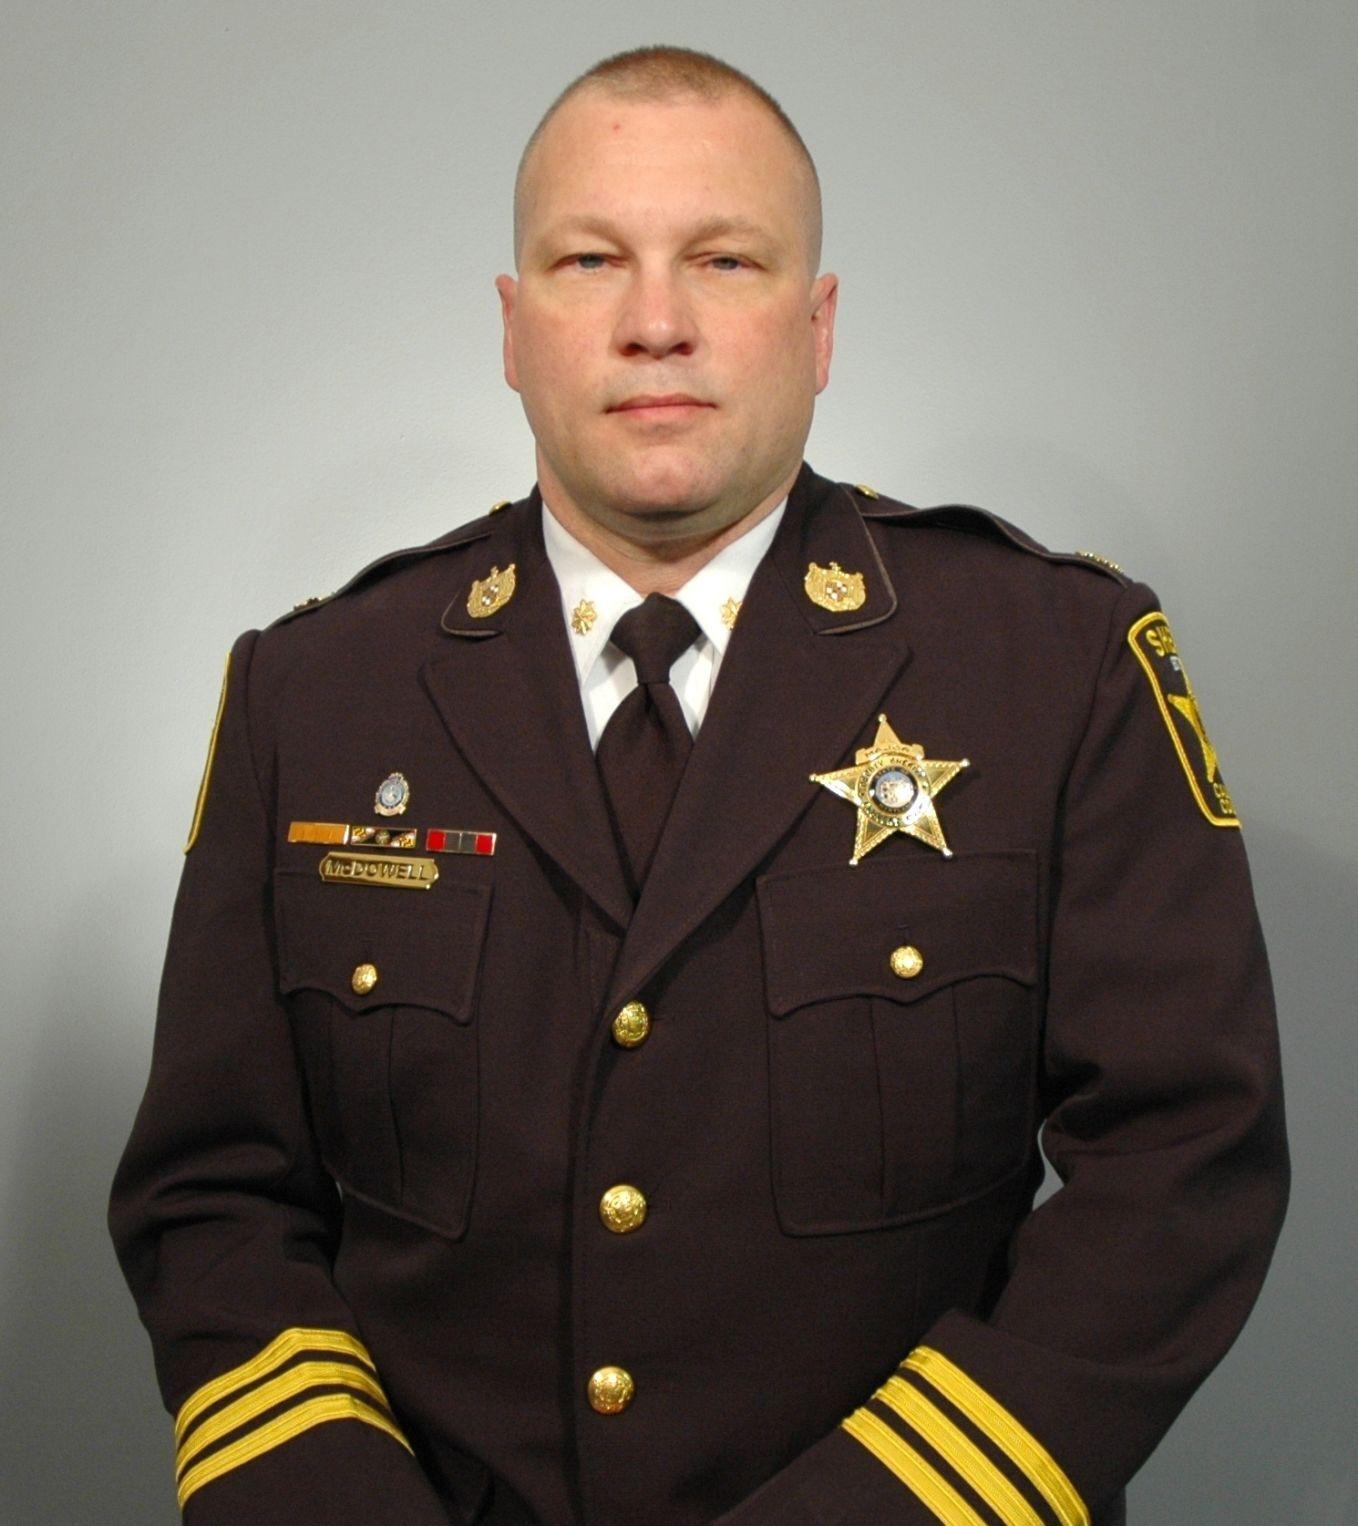 Calvert Sheriff staffing